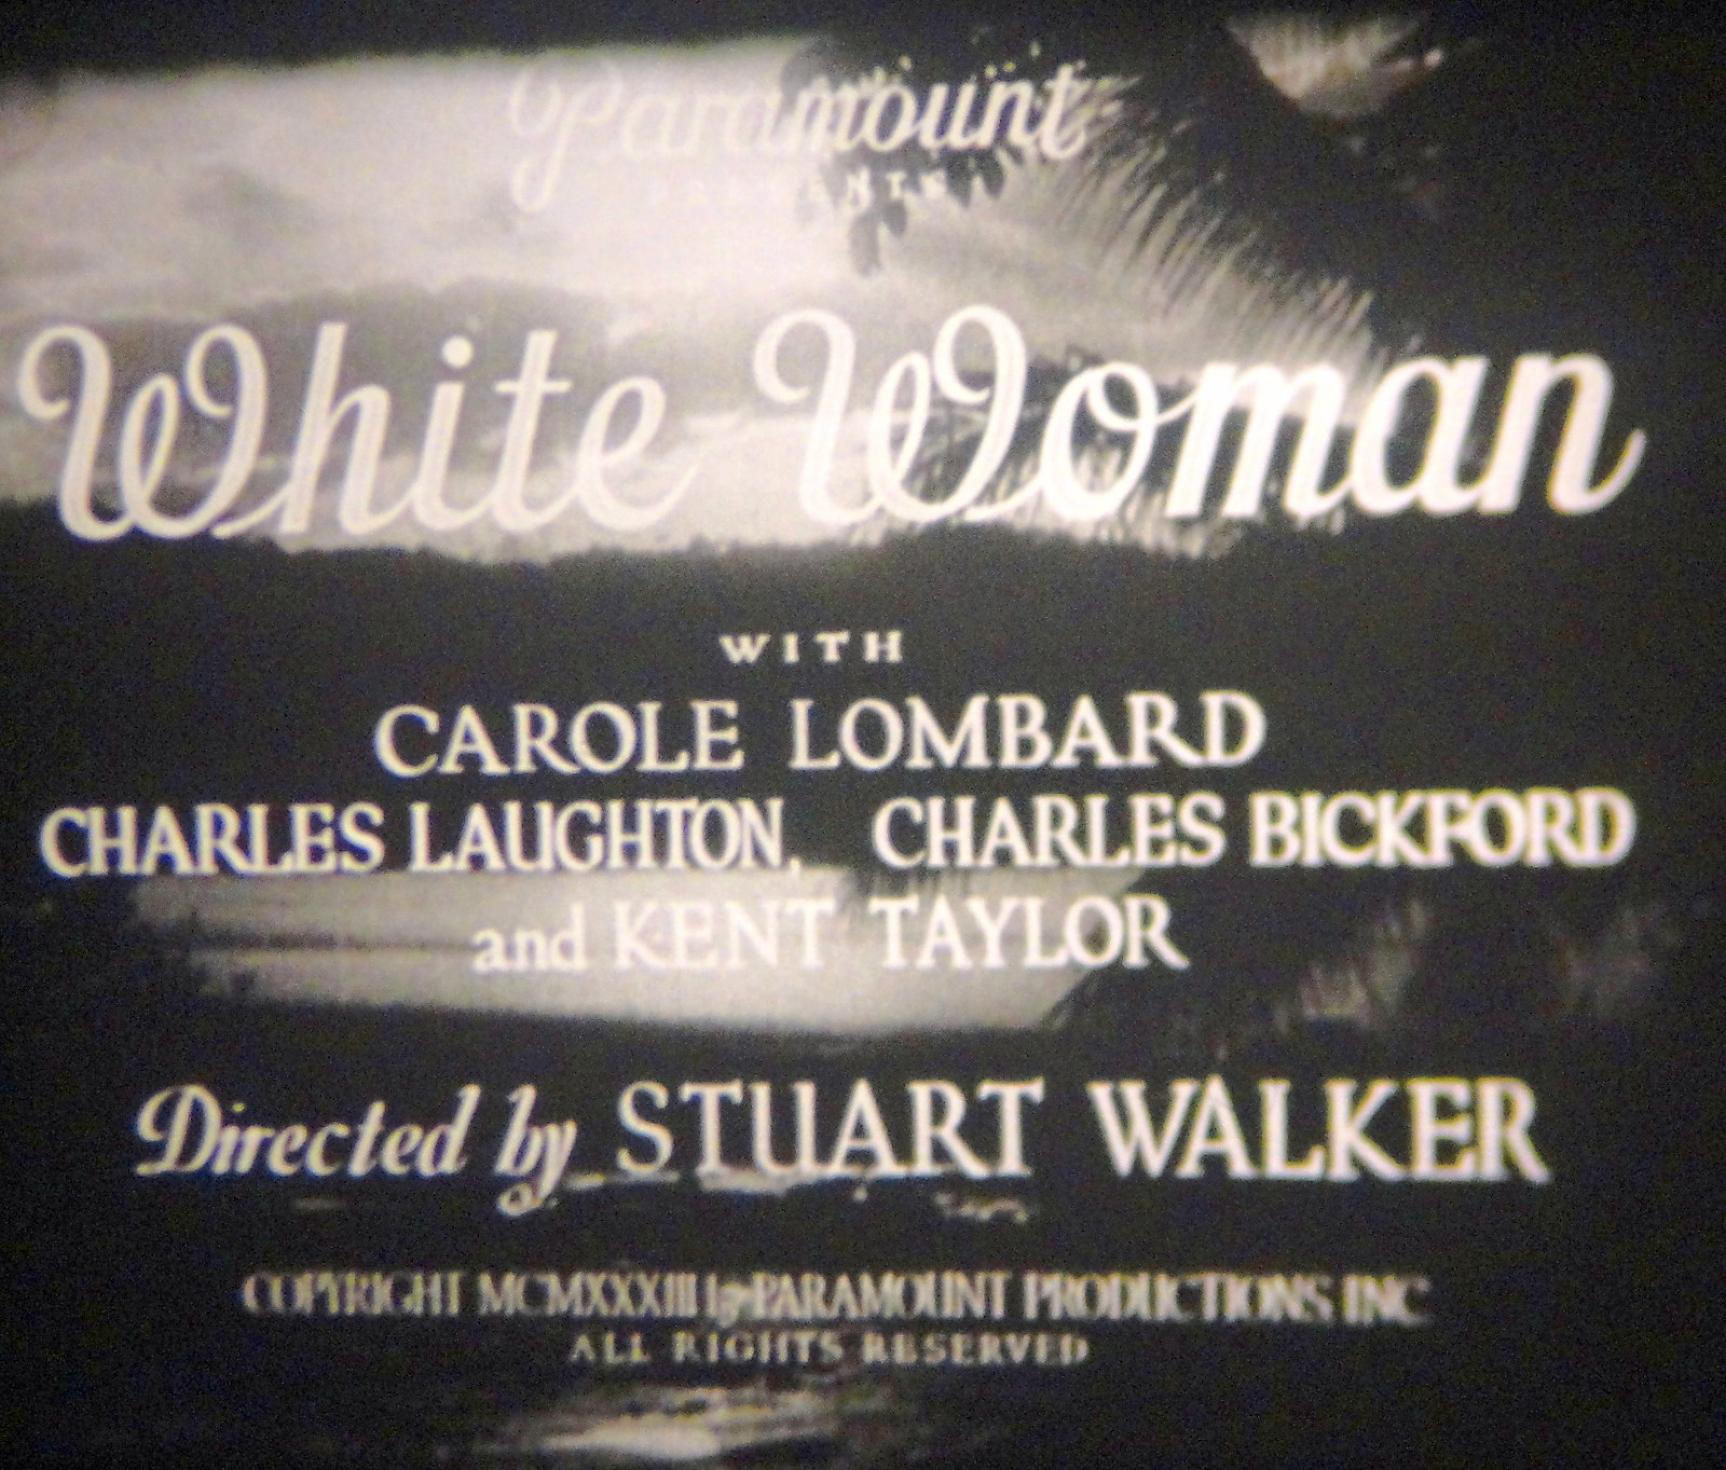 carole lombard white woman 16mm print credits 00a